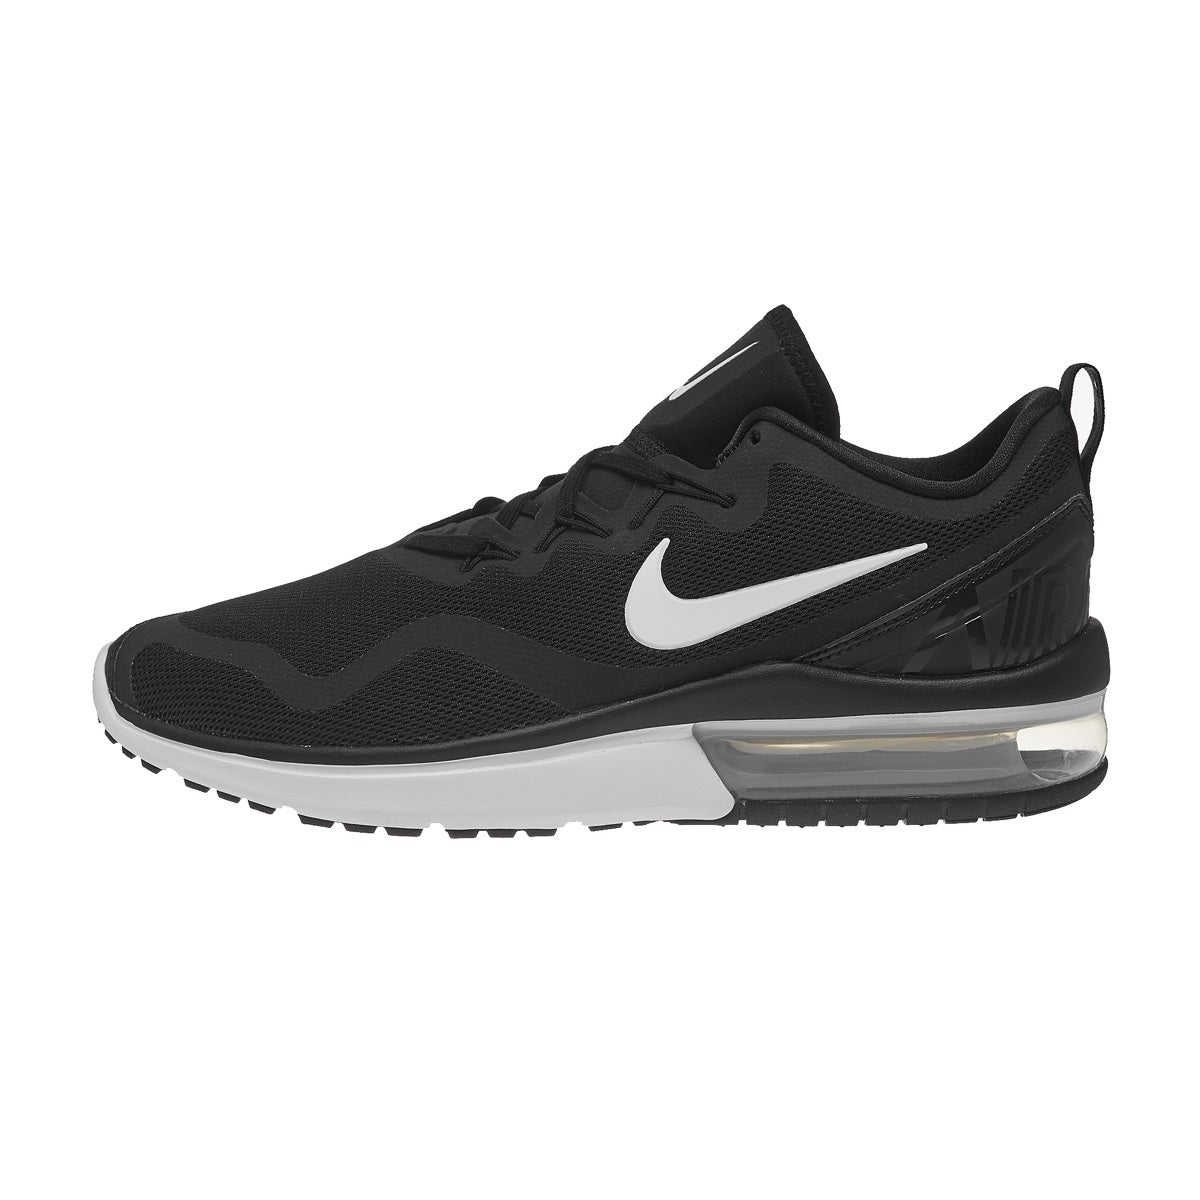 the latest 2bb66 6b068 Nike Air Max Fury Mens Shoes BlackWhite 360° View  Running Warehouse  Europe.